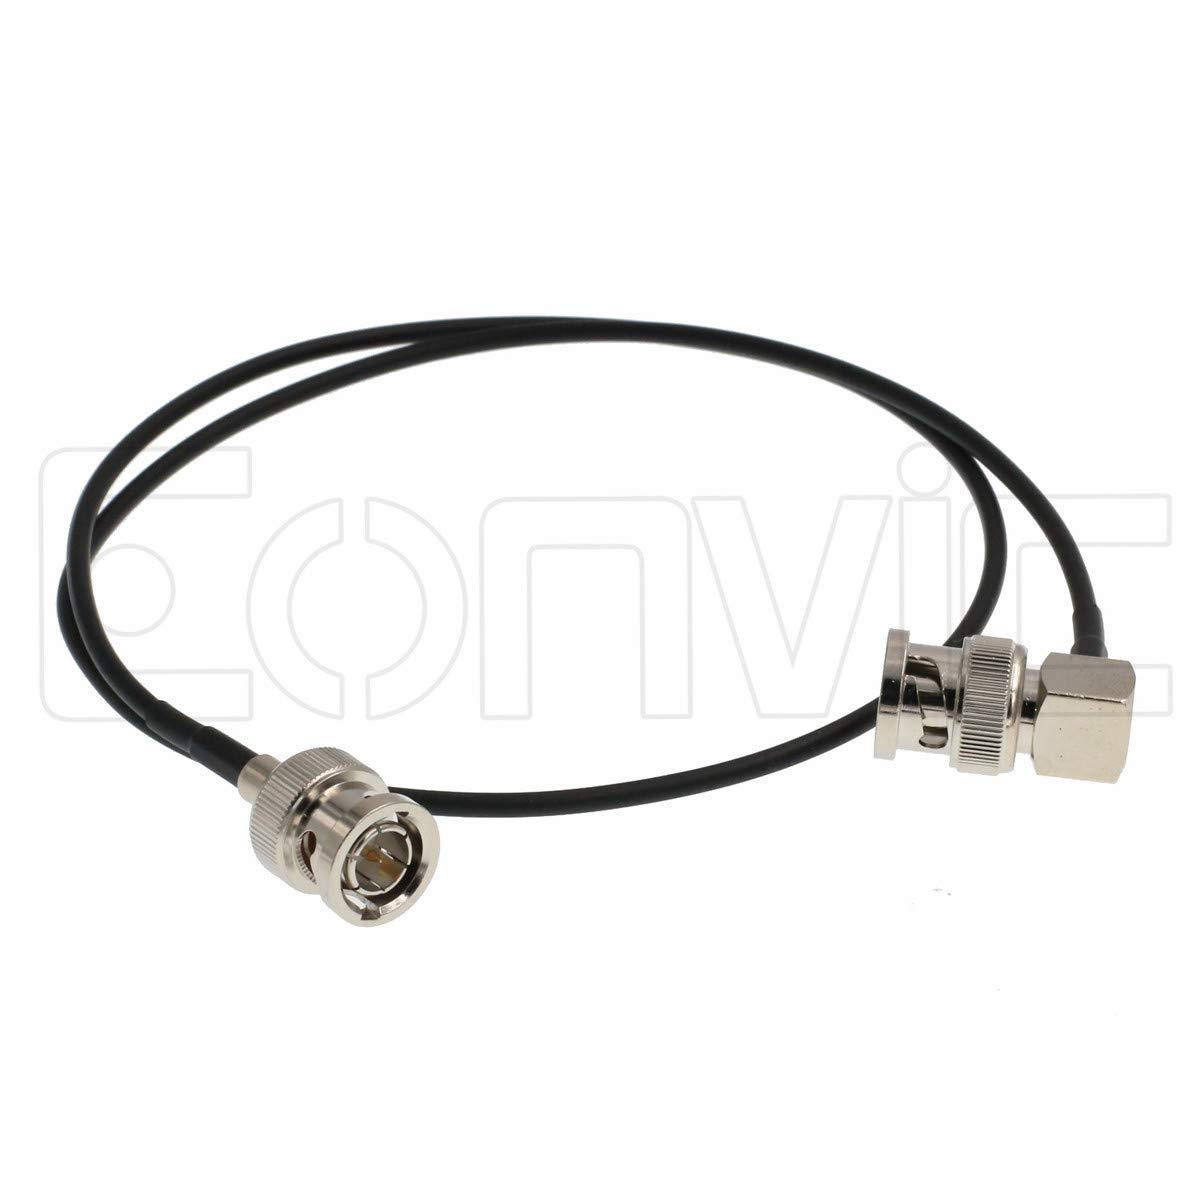 Eonvic 75Ohm BNC Male HD SDI Flexible RG174 RF Coaxial Cable for BMCC Video Camera (60CM Length) by Eonvic